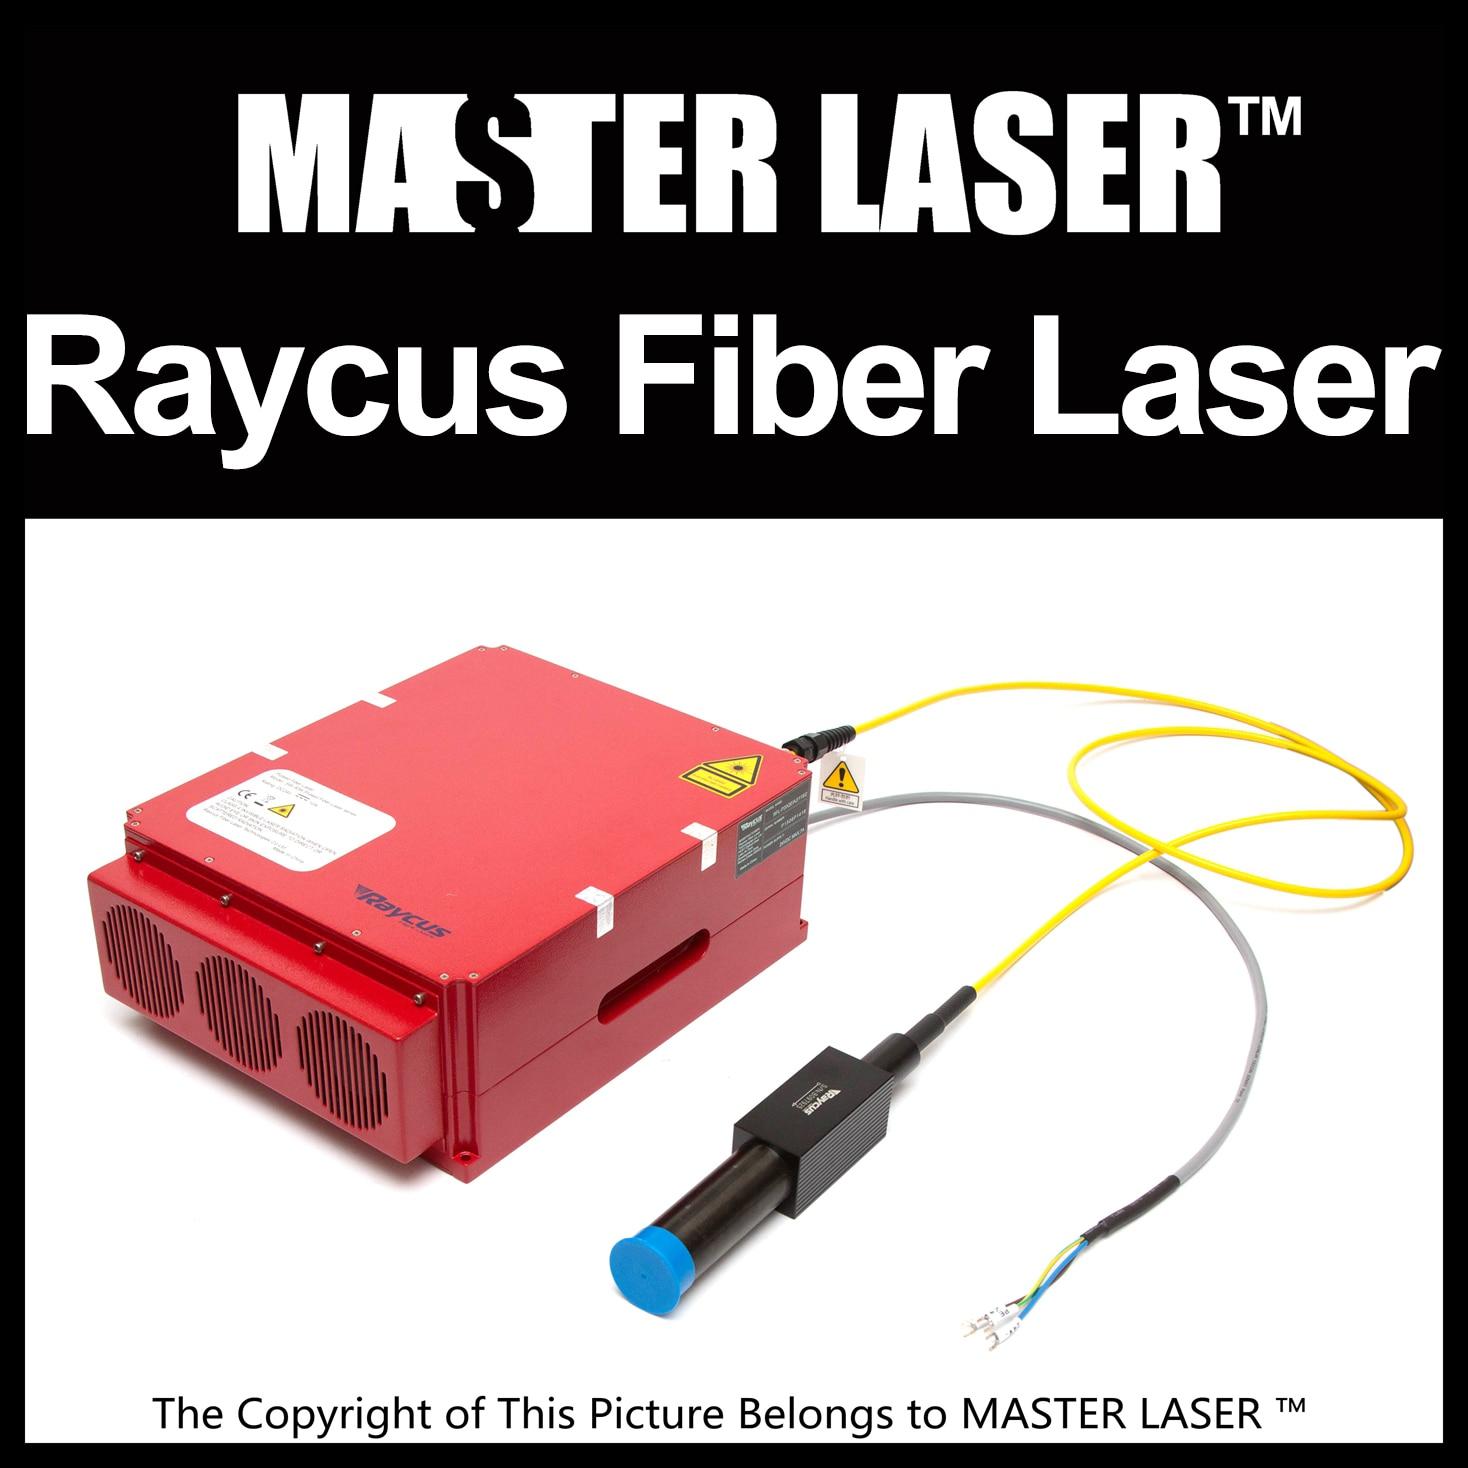 Discount Raycus 20W 30W 50W Fiber Laser Source big discount 20w 30w 50w 100w raycus fiber laser source